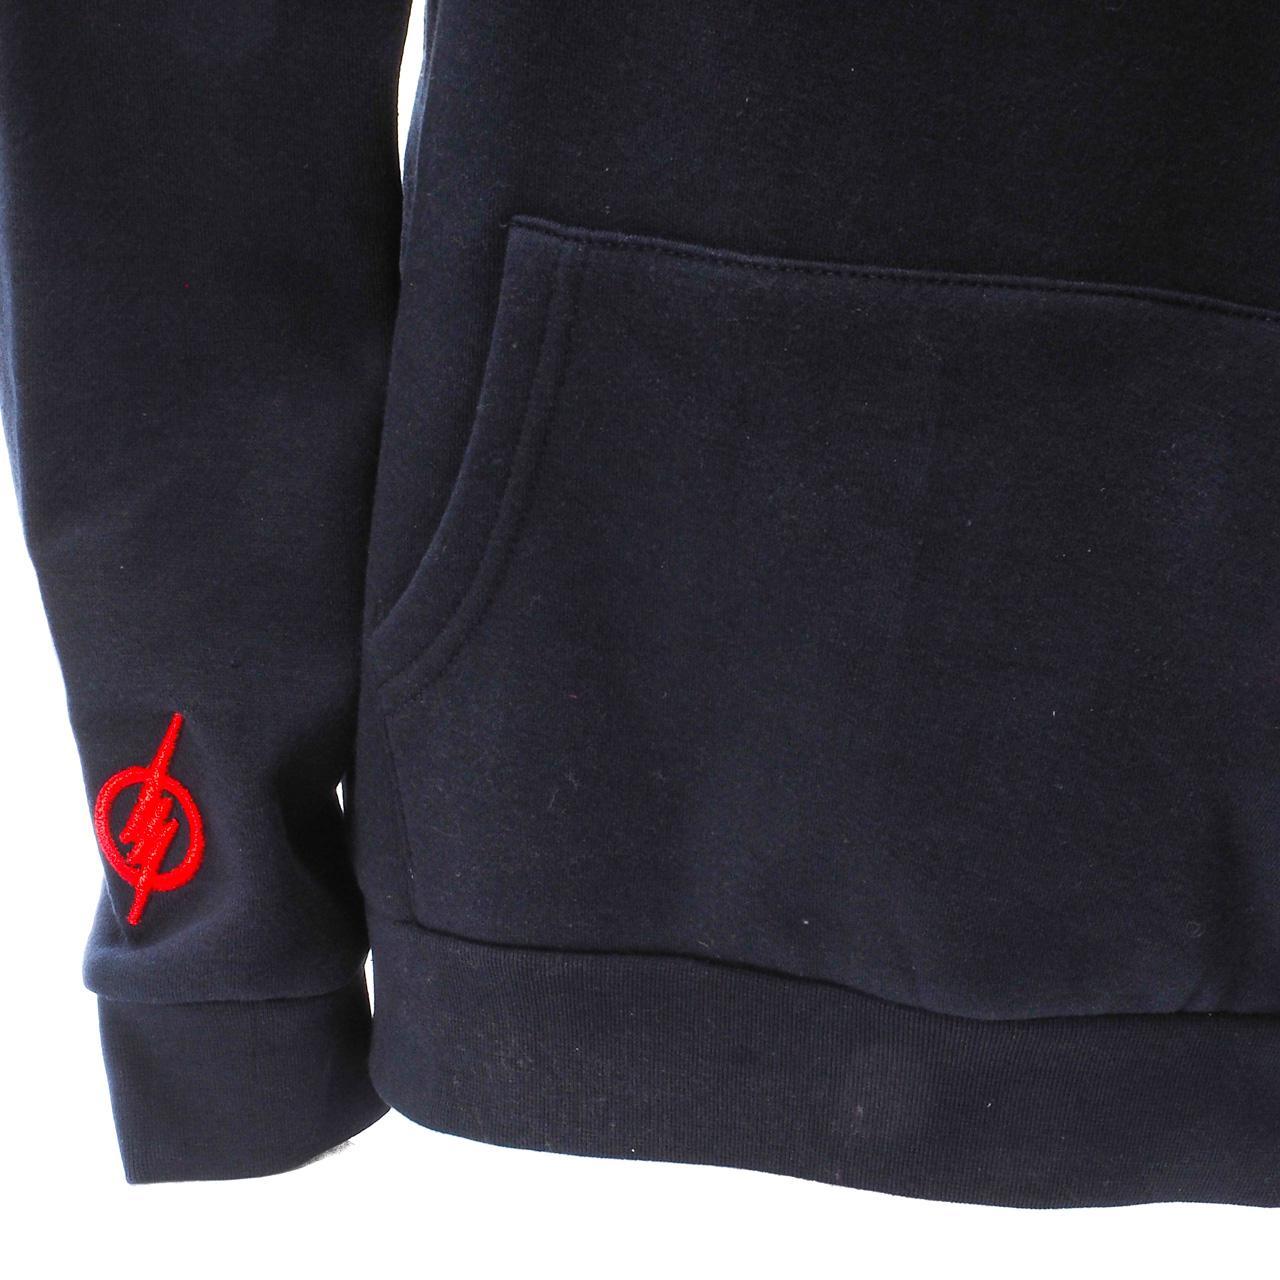 Sweat-Usual-suspect-story-jeans-Mbappe-sweat-navy-jr-Bleu-47921-Neuf miniature 4